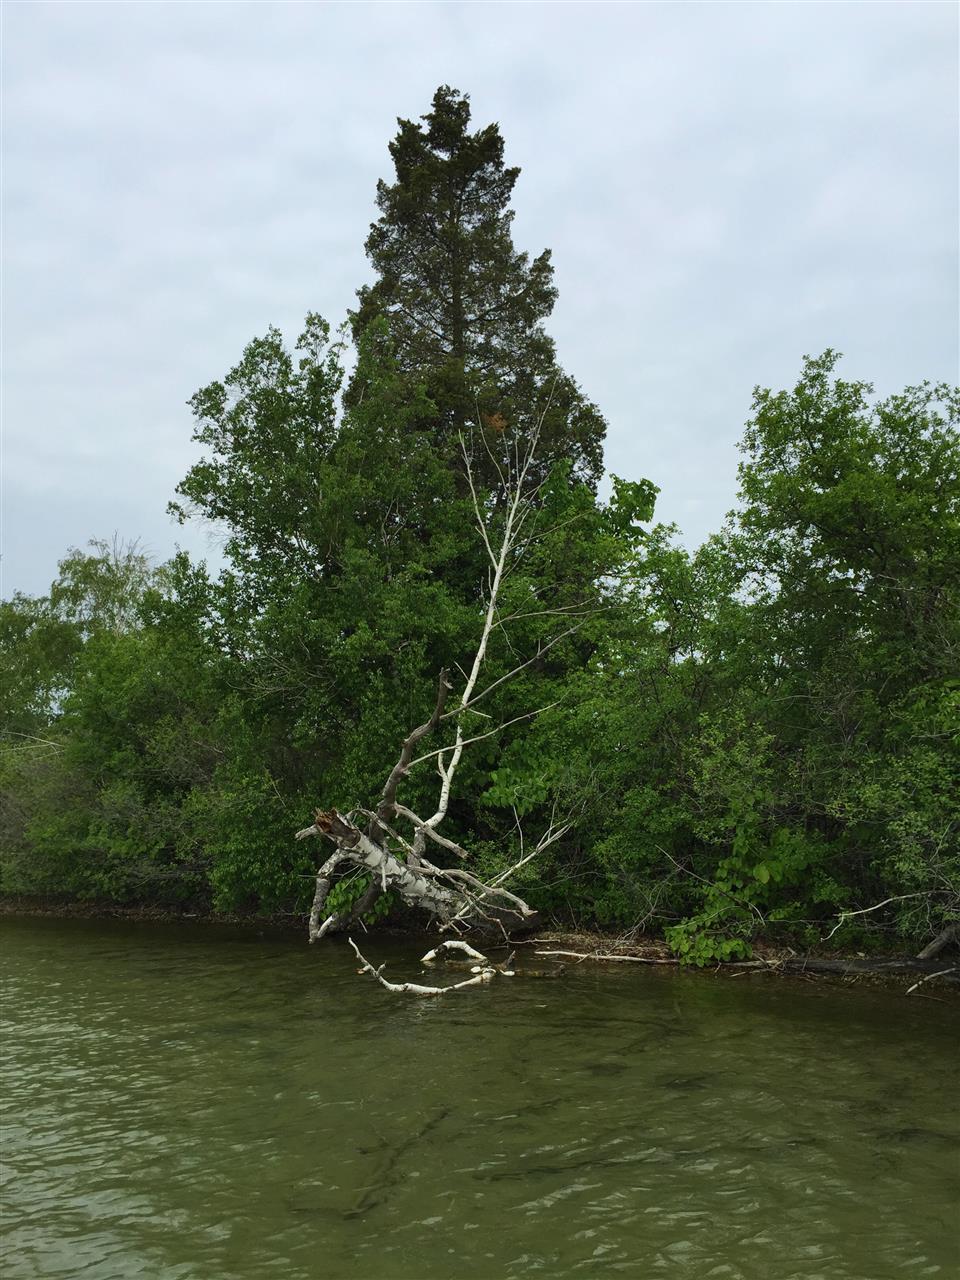 Cedar Island shoreline in Orchard Lake. Orchard Lake, Michigan #LeadingRElocal #OrchardLake #Michigan